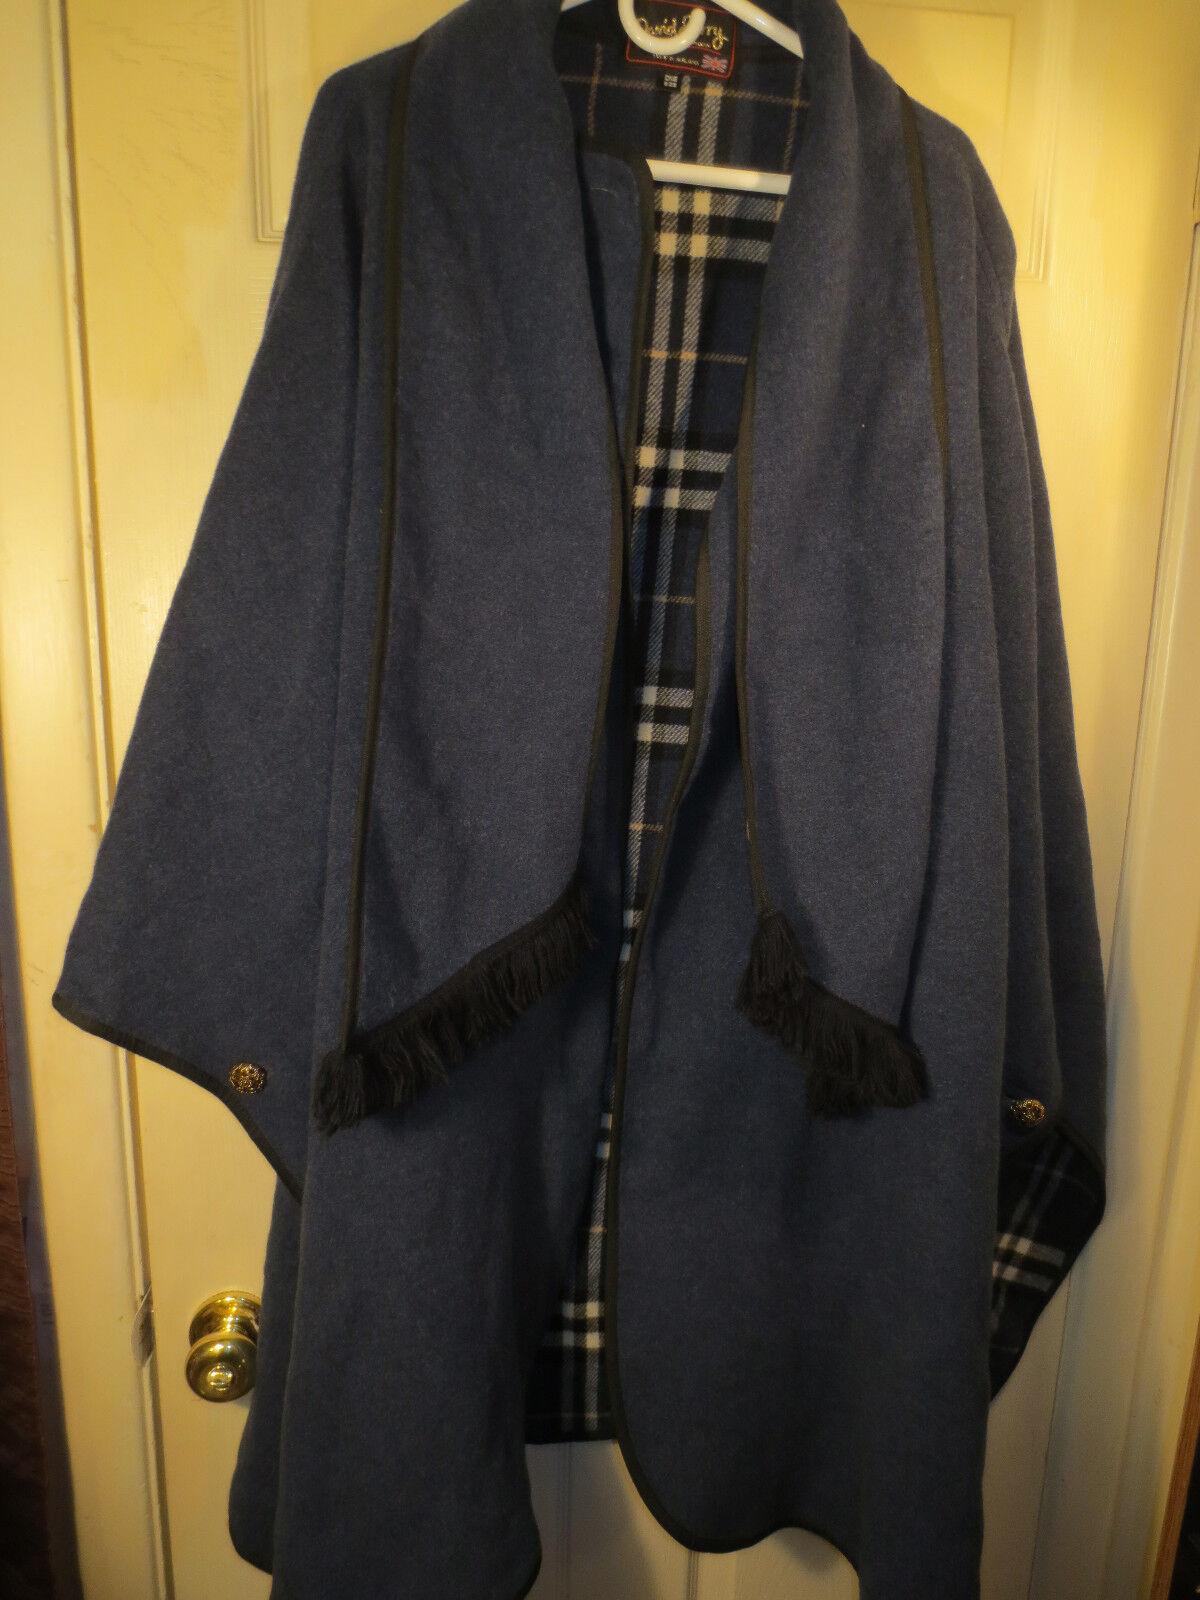 Designer David Barry bluee Wool Blend Cape Shawl Coat Women's One Size